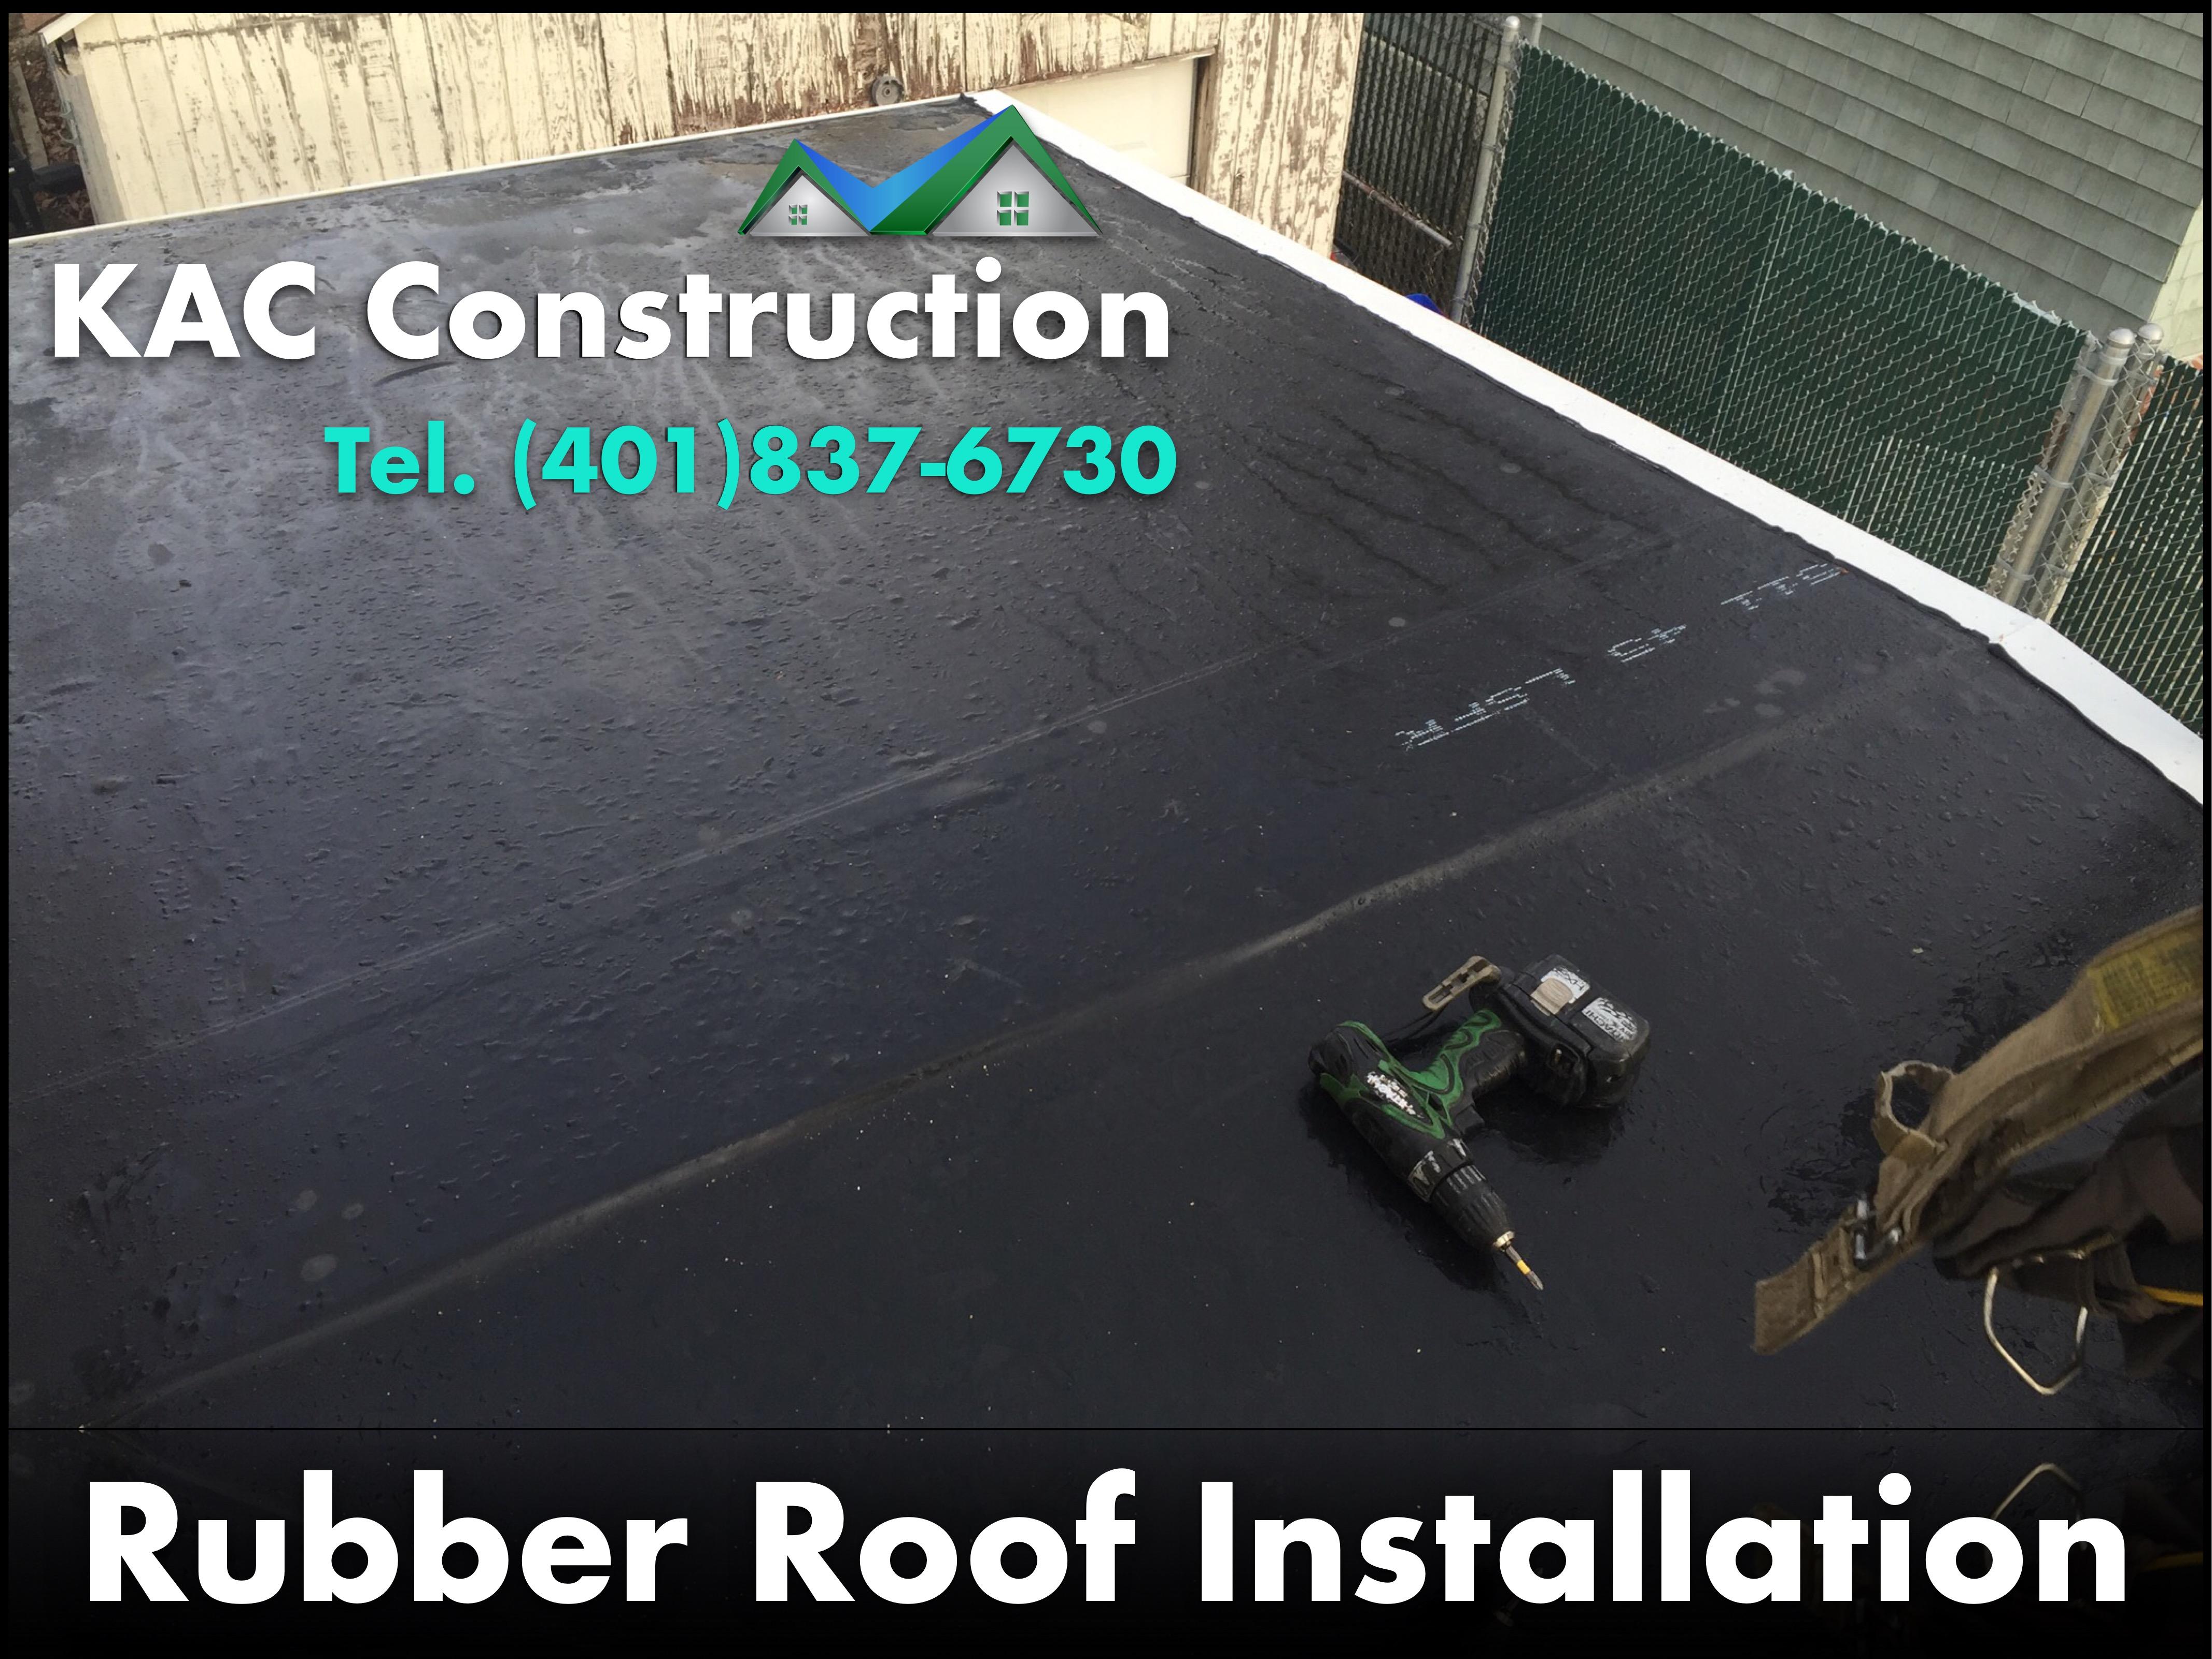 Rubber roof, rubber roof providence, rubber roof providence ri, rubber roof installation,rubber roof installation providence, rubber roof installation providence ri, rubber roof installation in providence, rubber roof installation in providence ri,